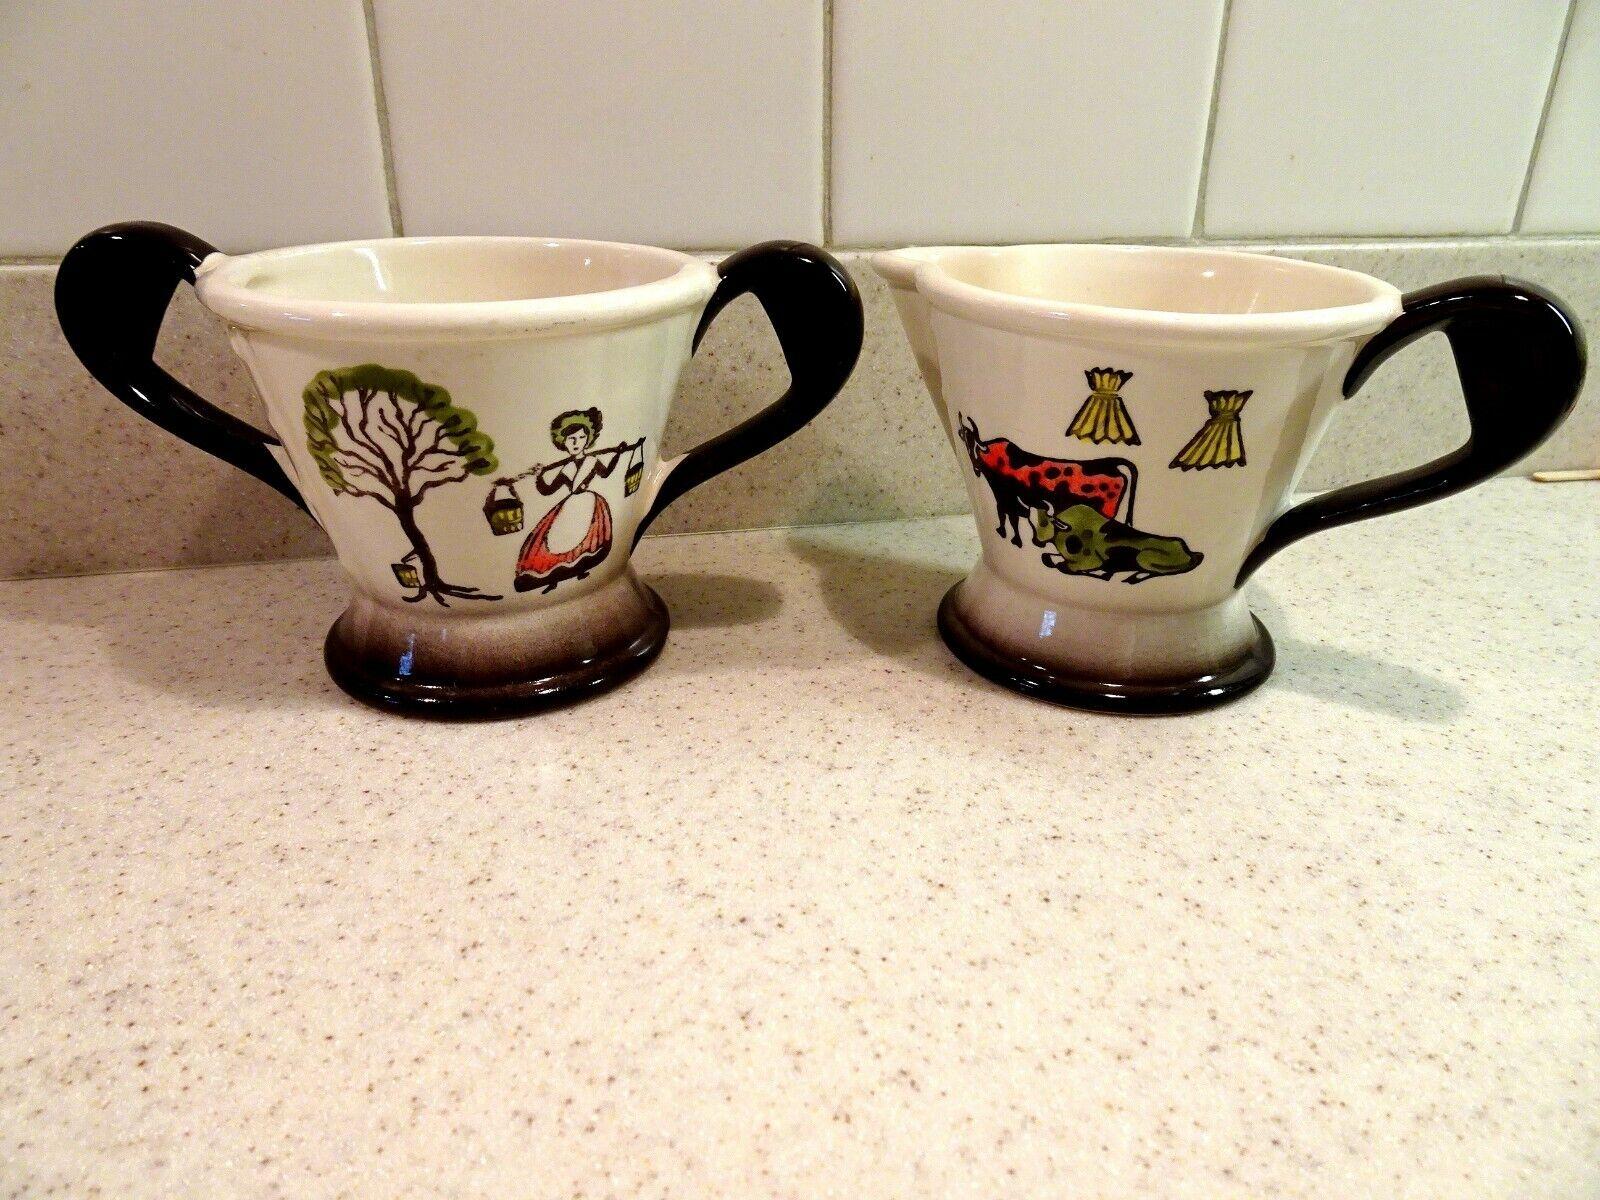 Vtg Metlox Poppytrail Homestead Provincial Cream Sugar Bowl California Pottery - $6.99